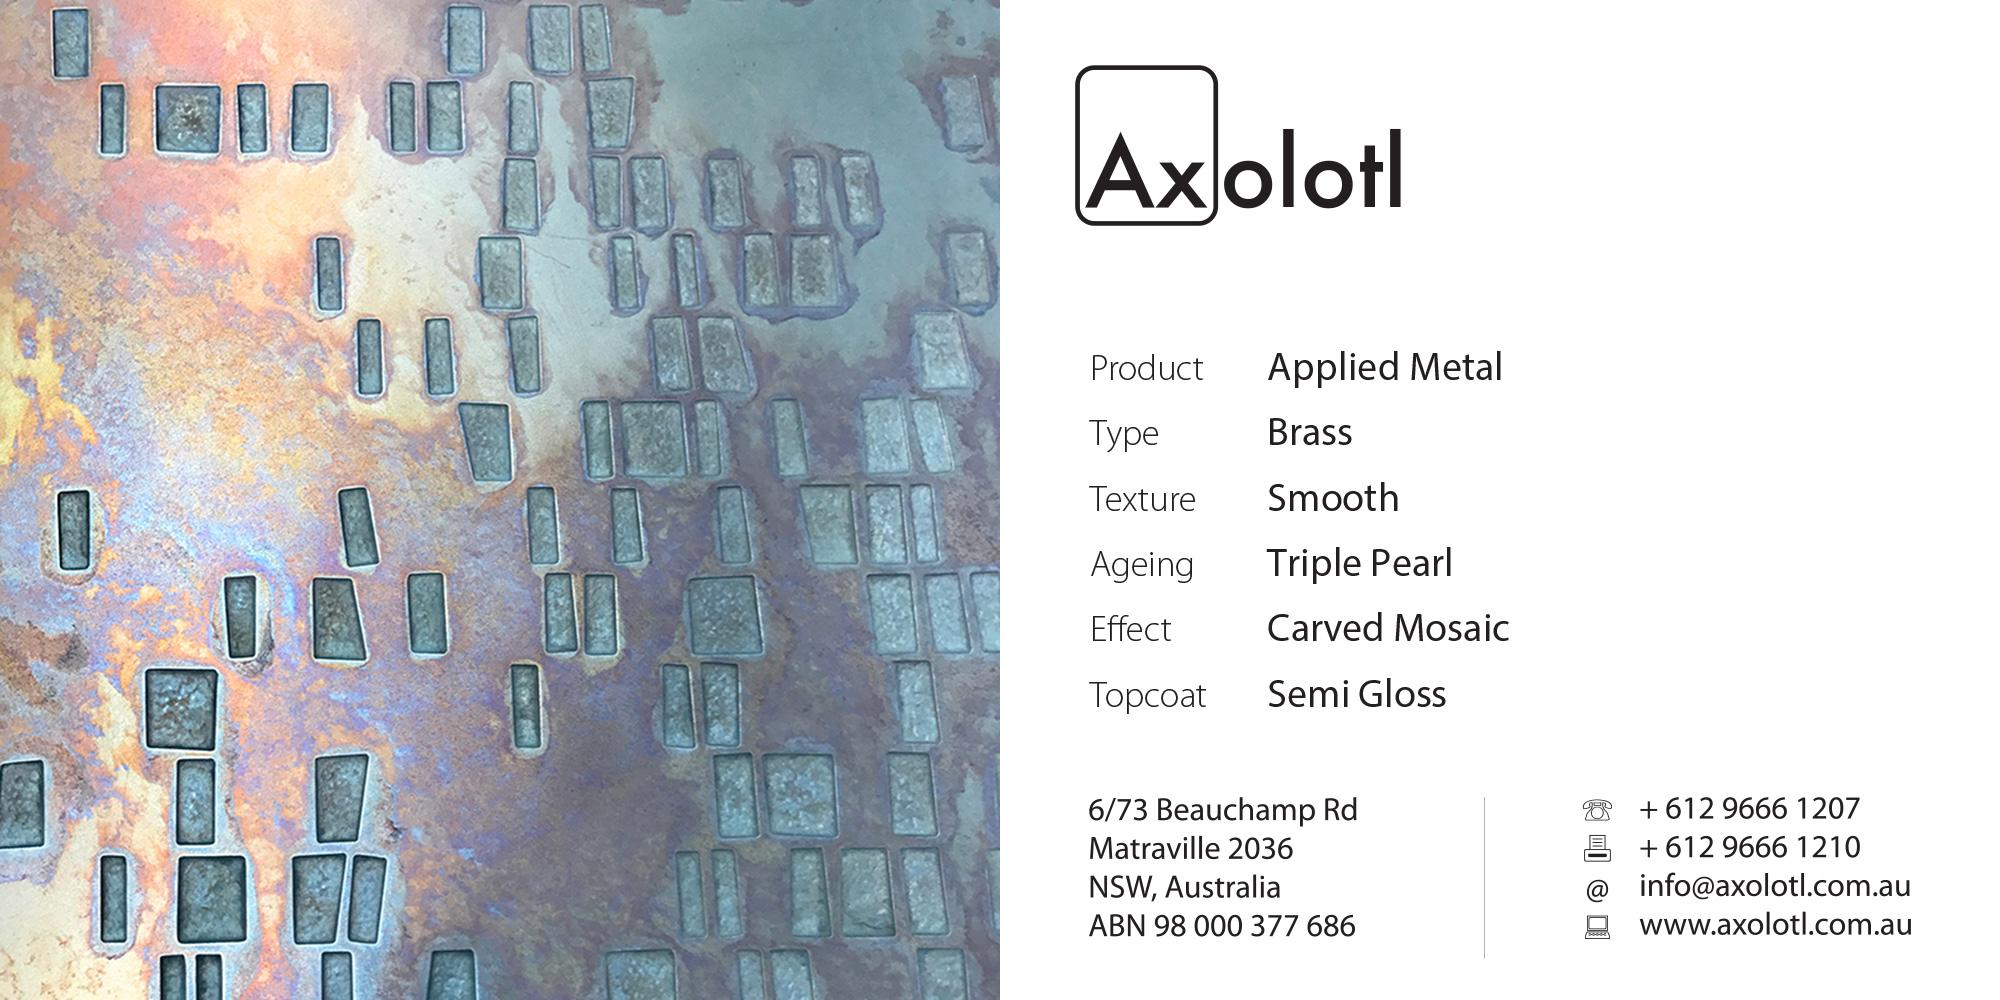 Axolotl_CARVED_MOSAIC_BrassSmoothTriplePearl01.jpg